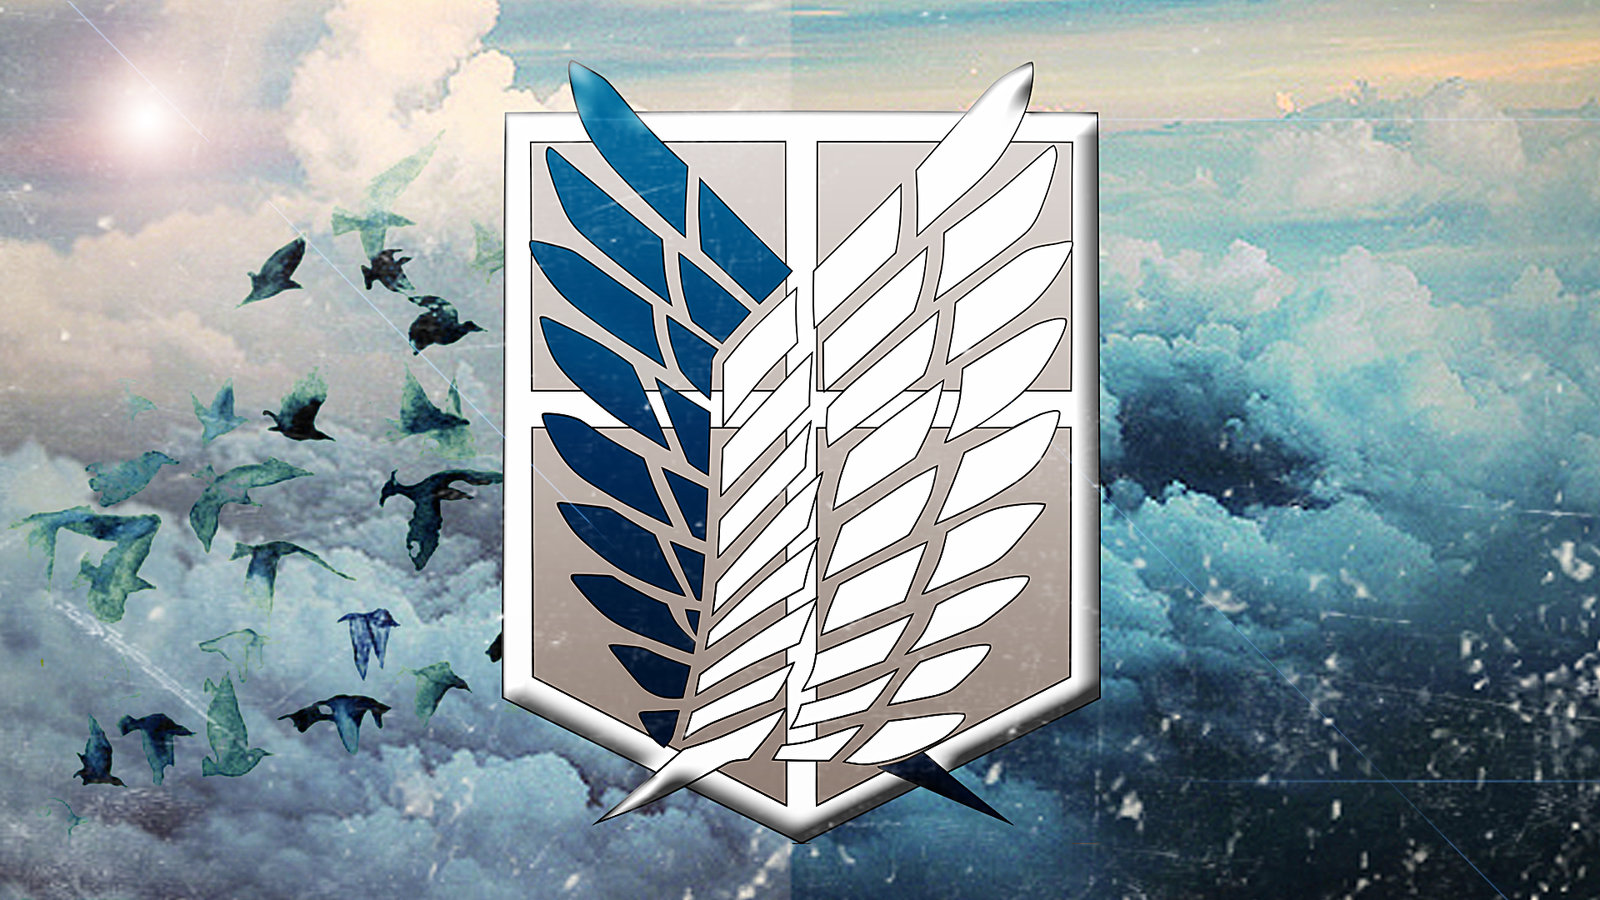 Axxis - Wings Of Freedom Lyrics